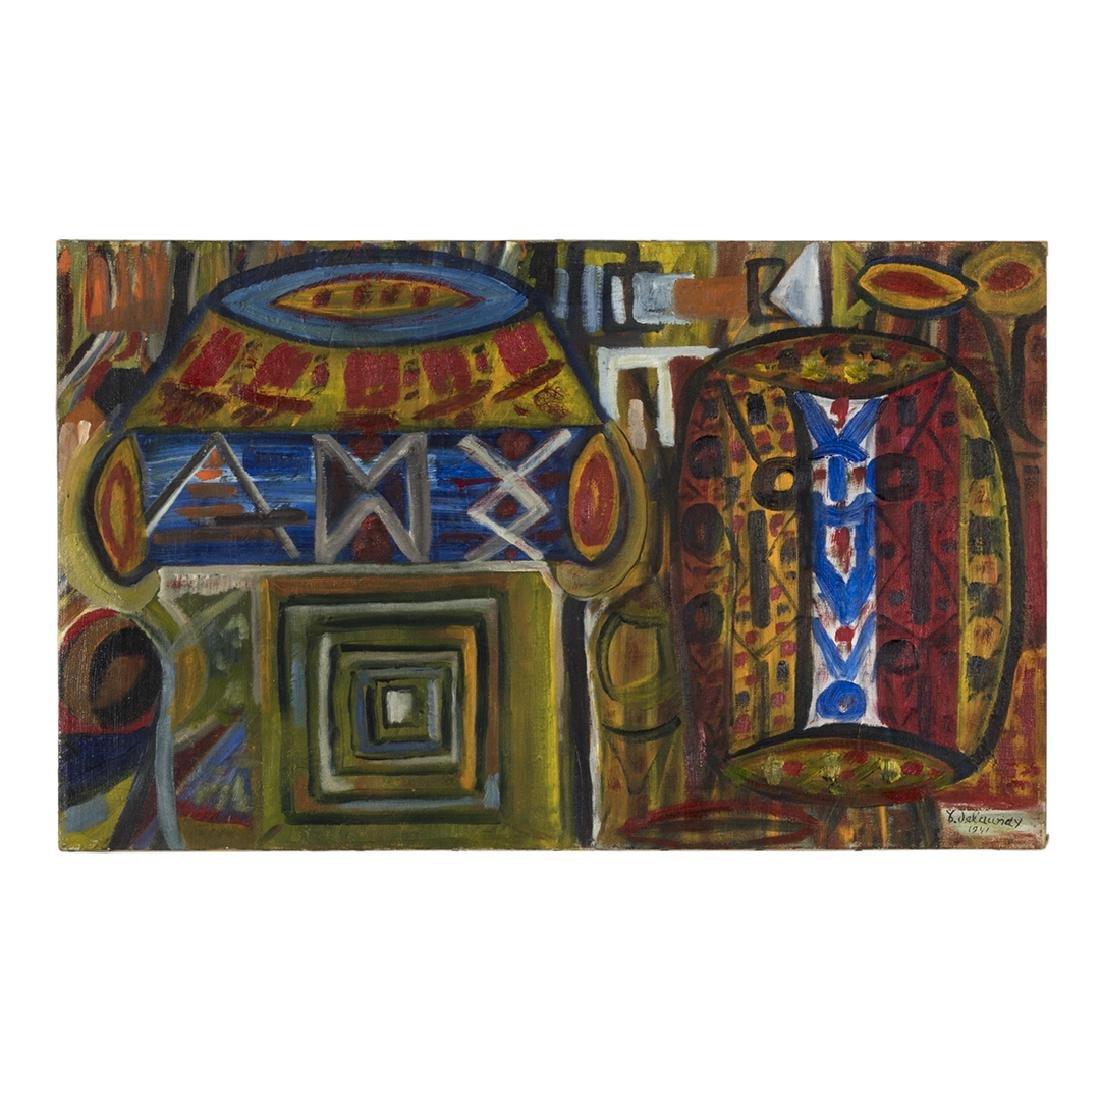 R. Delaunay Abstract